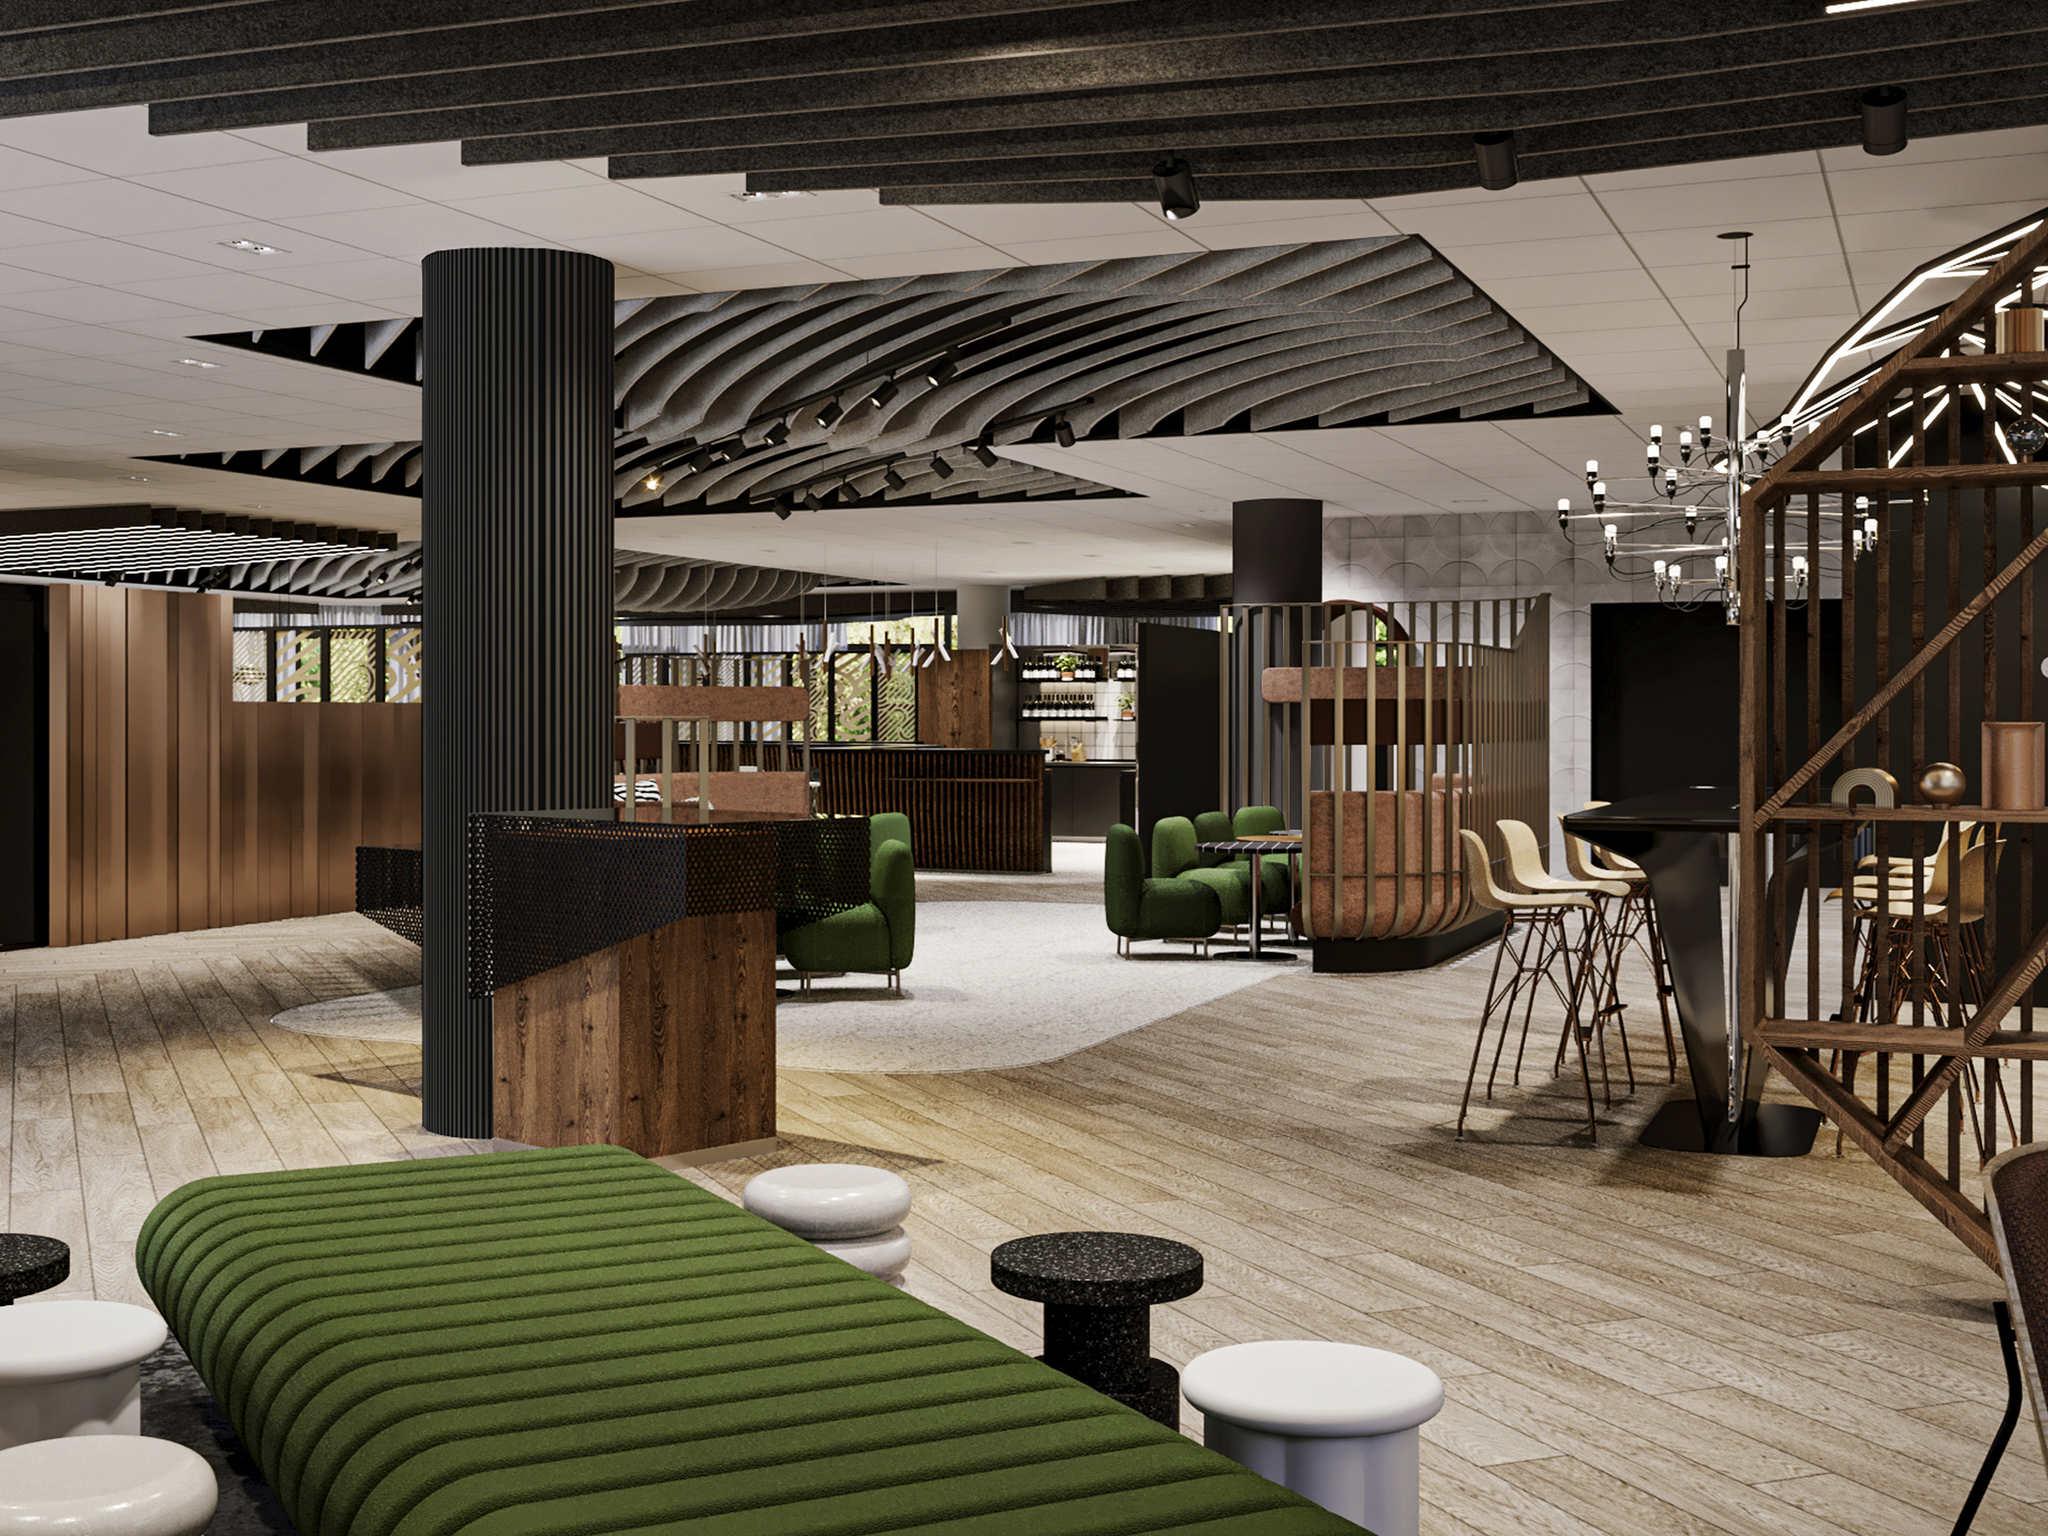 Hotel en CHASSENEUIL DU POITOU - Novotel Poitiers Site du Futuroscope